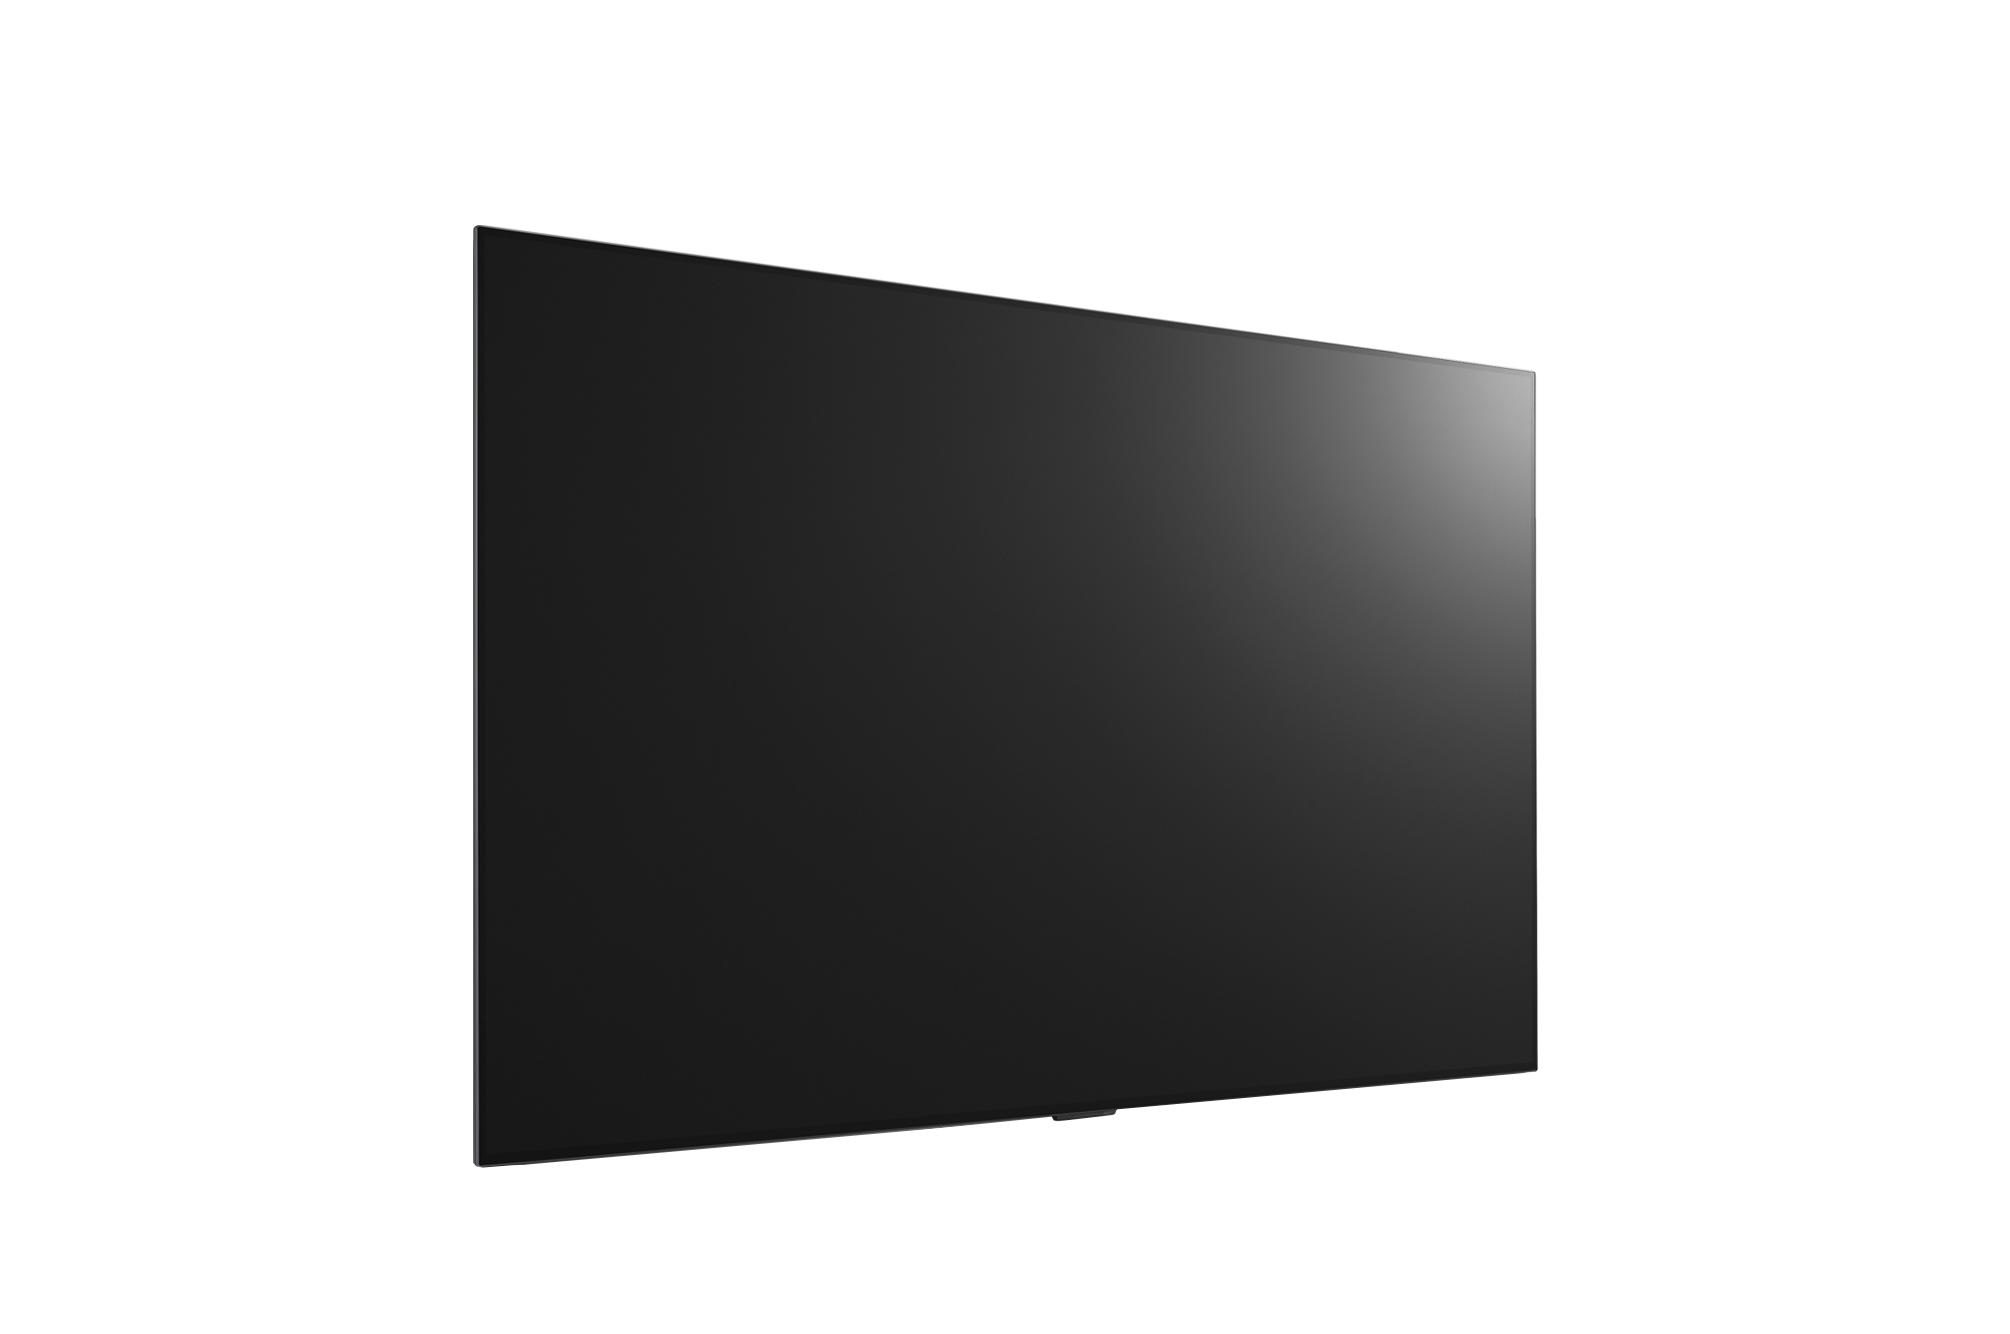 LG Pro:Centric SMART 65WS960H (EU) 5